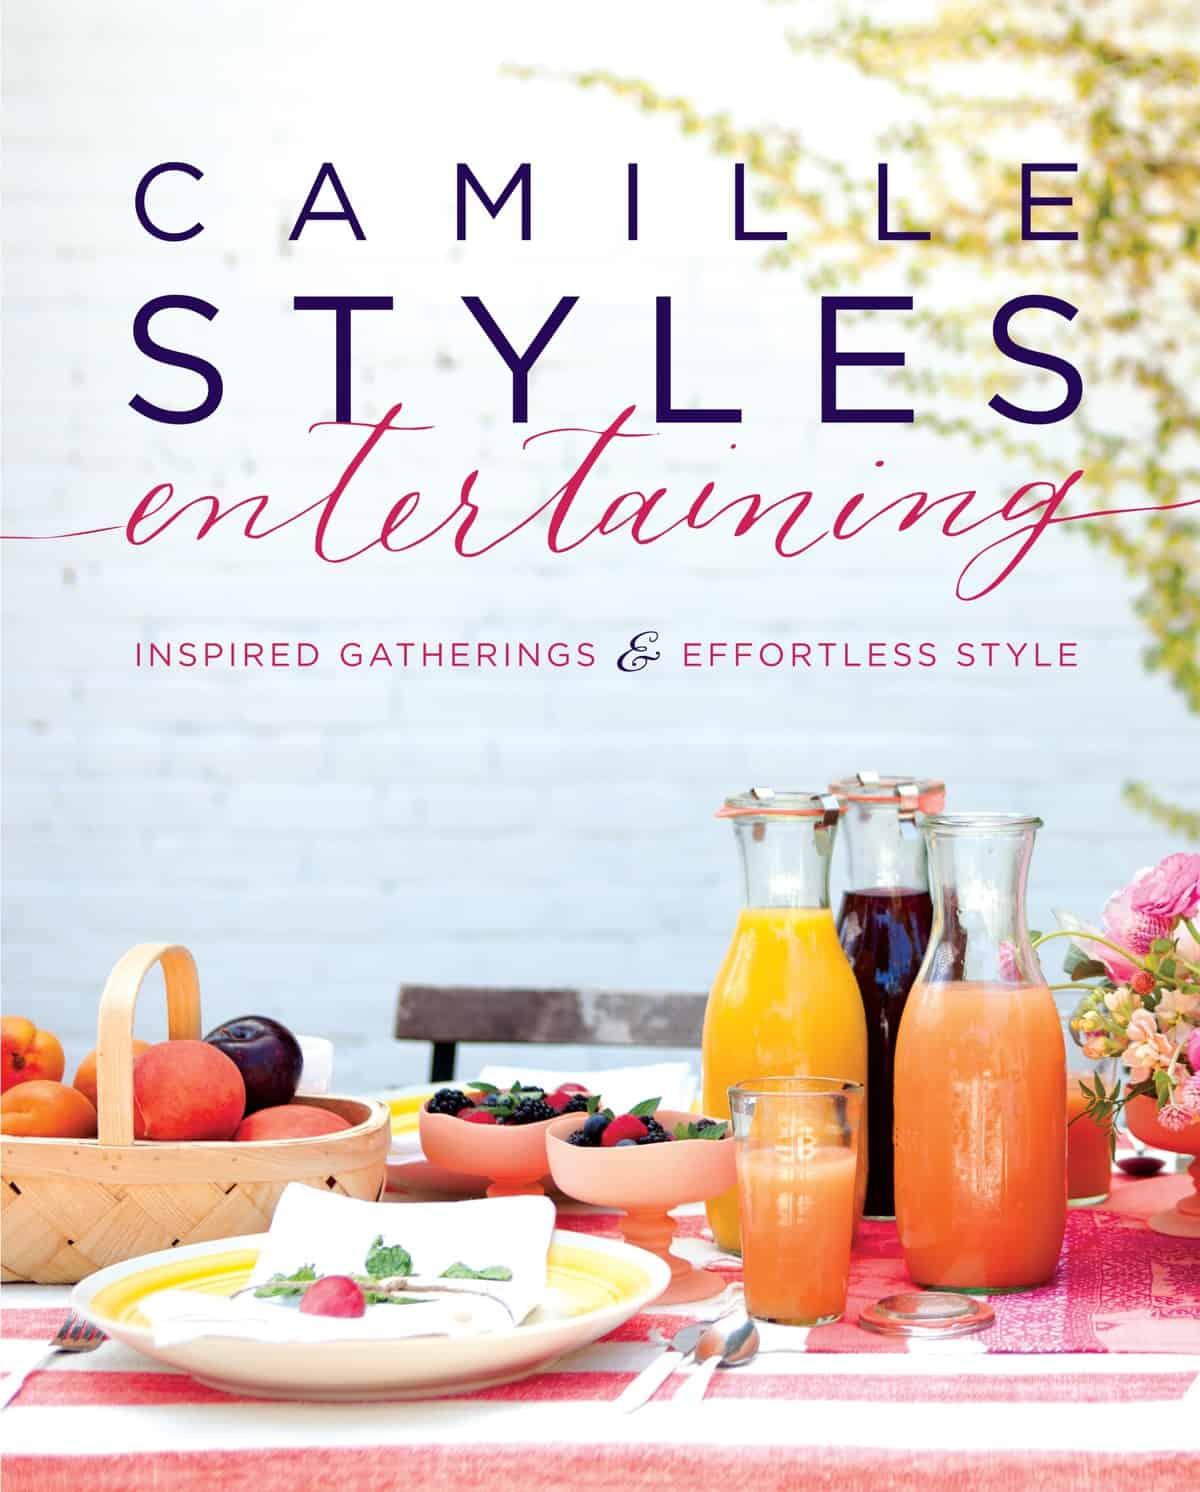 CamilleStylesEntertaining hc c